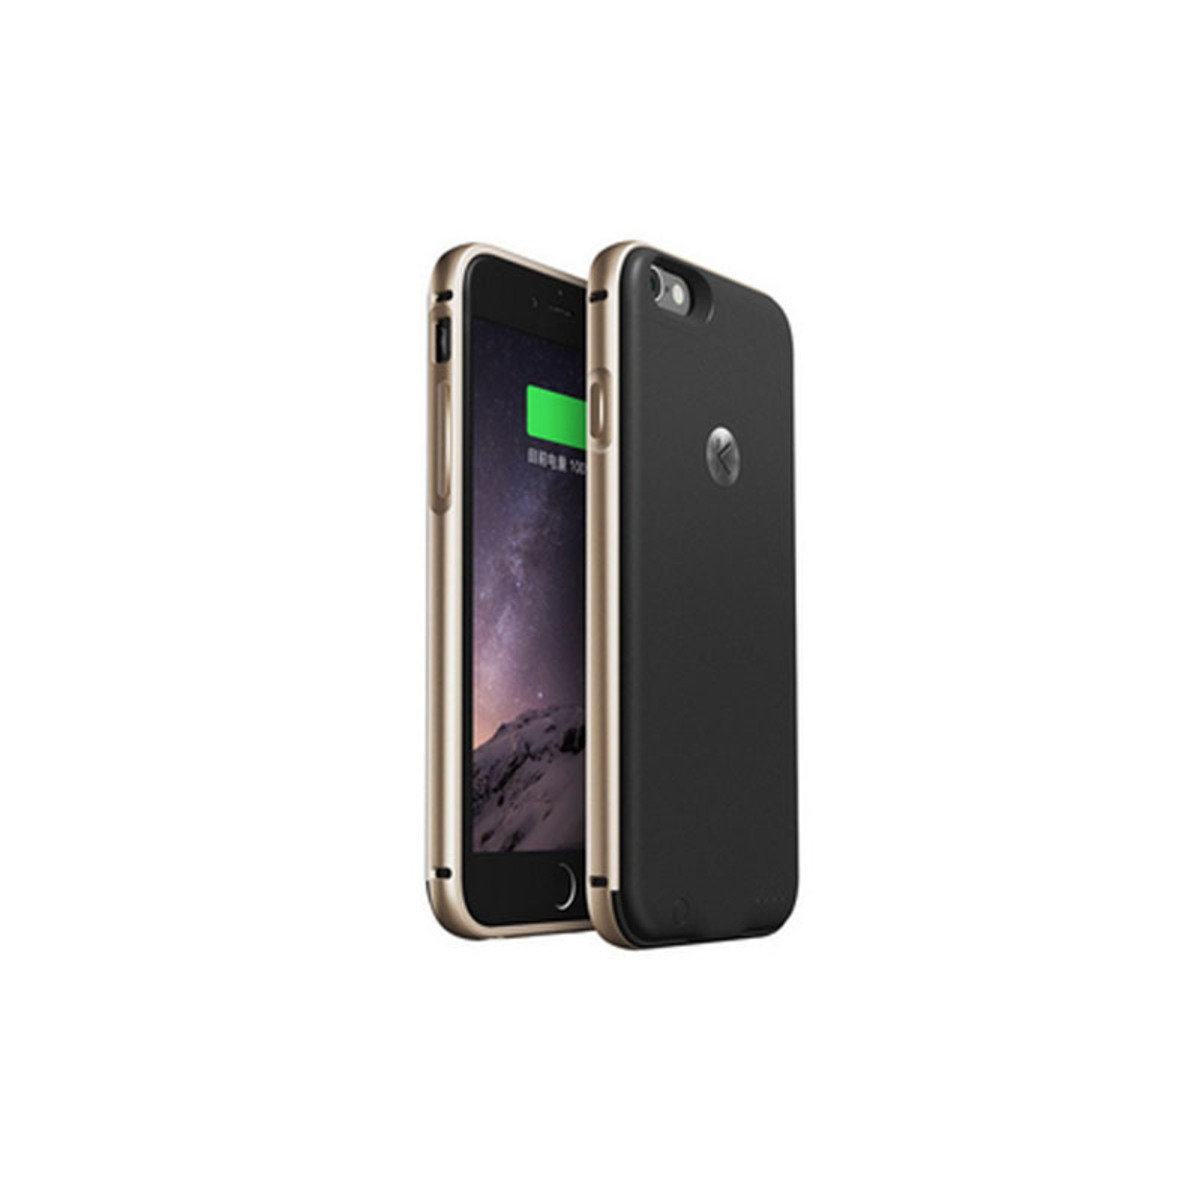 iPhone 6 / 6S 專用金屬邊框機殼連2400mAh充電池 金色+黑色